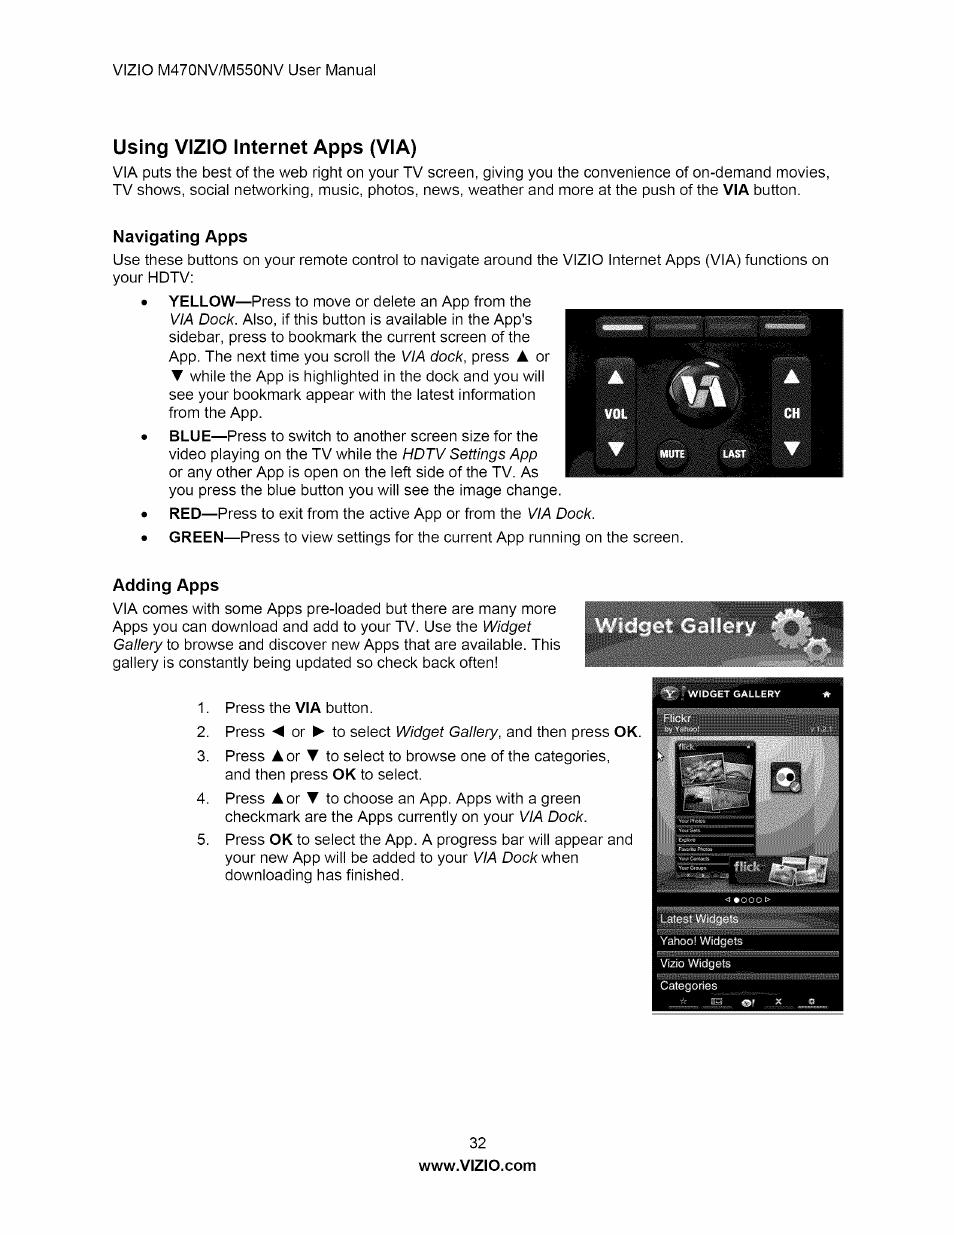 using vizio internet apps via navigating apps adding apps rh manualsdir com Vizio M470NV Button Location Vizio M470NV Remote for TV